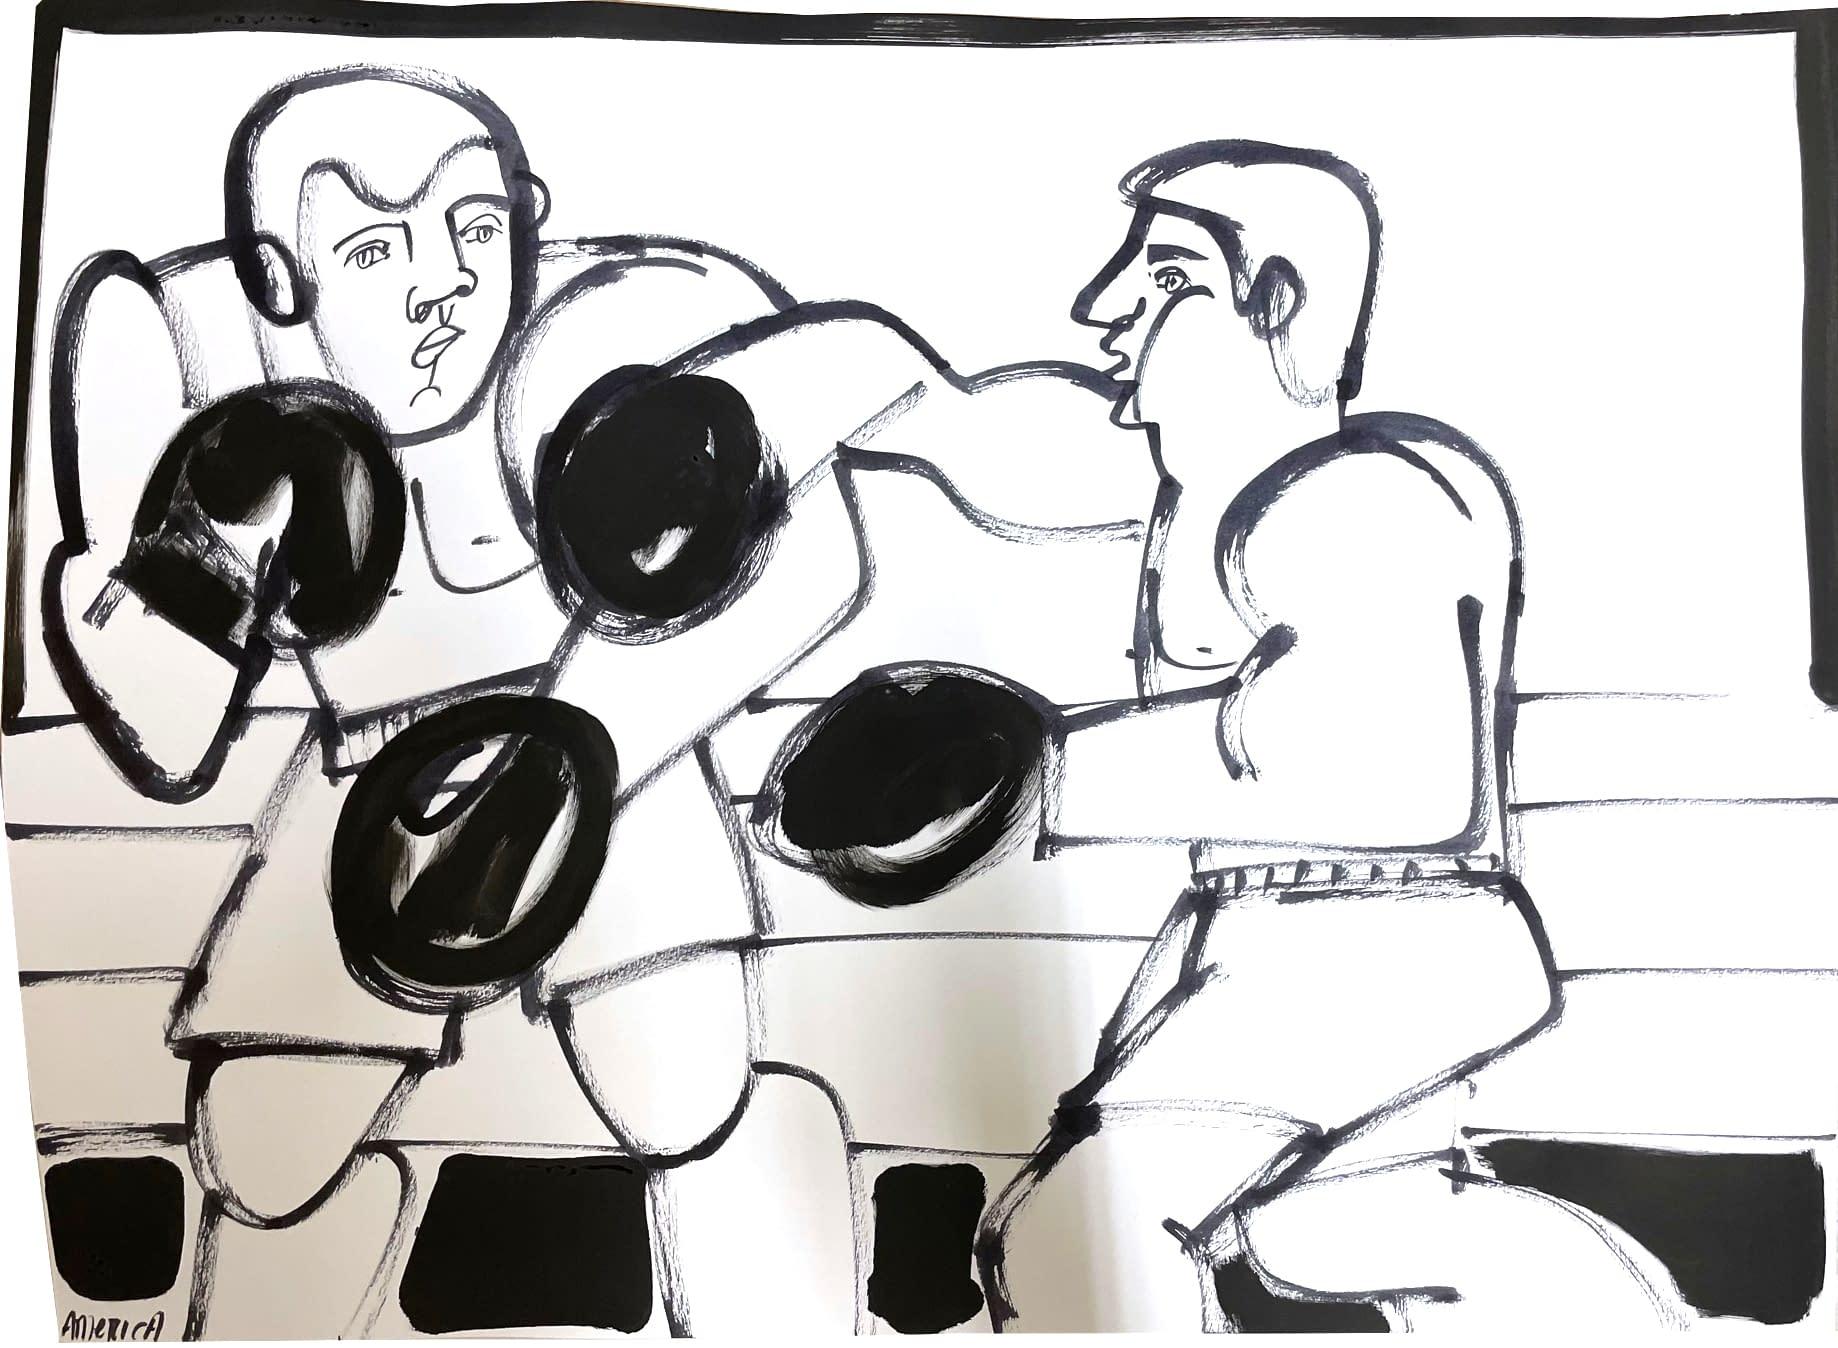 boxer i, america martin, ink on paper, black and white figurative